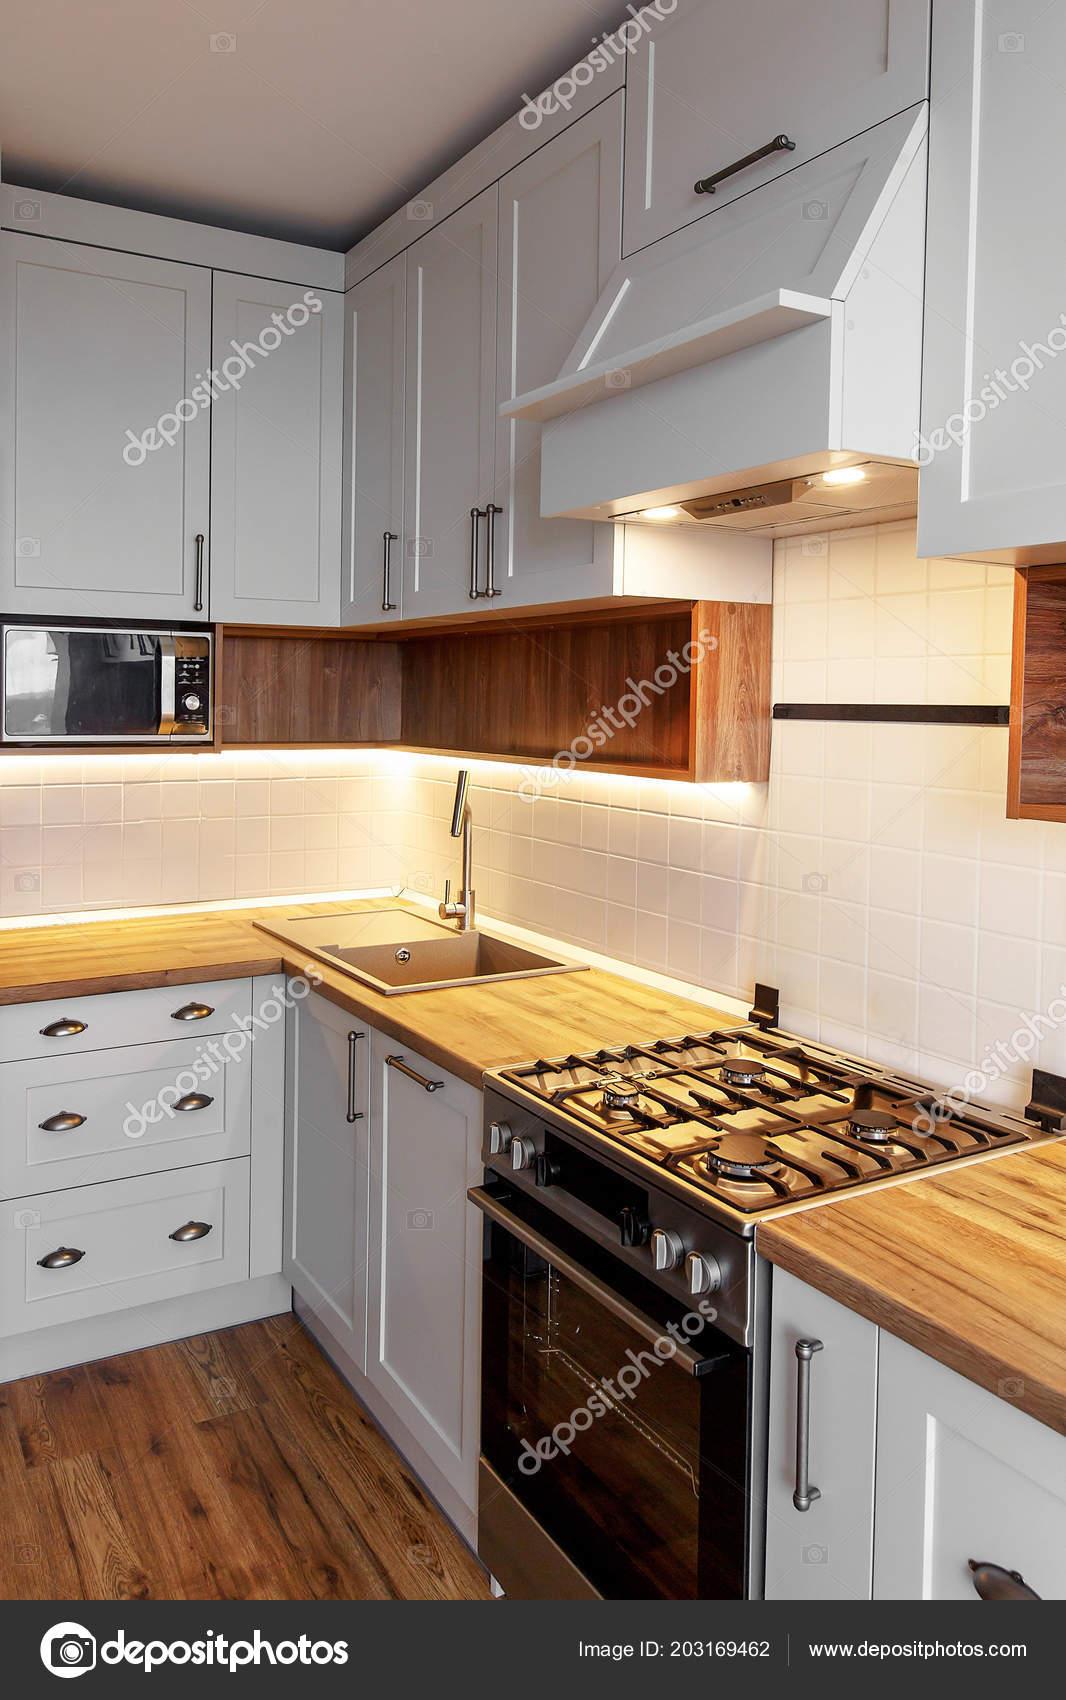 Stylish Light Gray Kitchen Interior Modern Cabinets Light Stainless